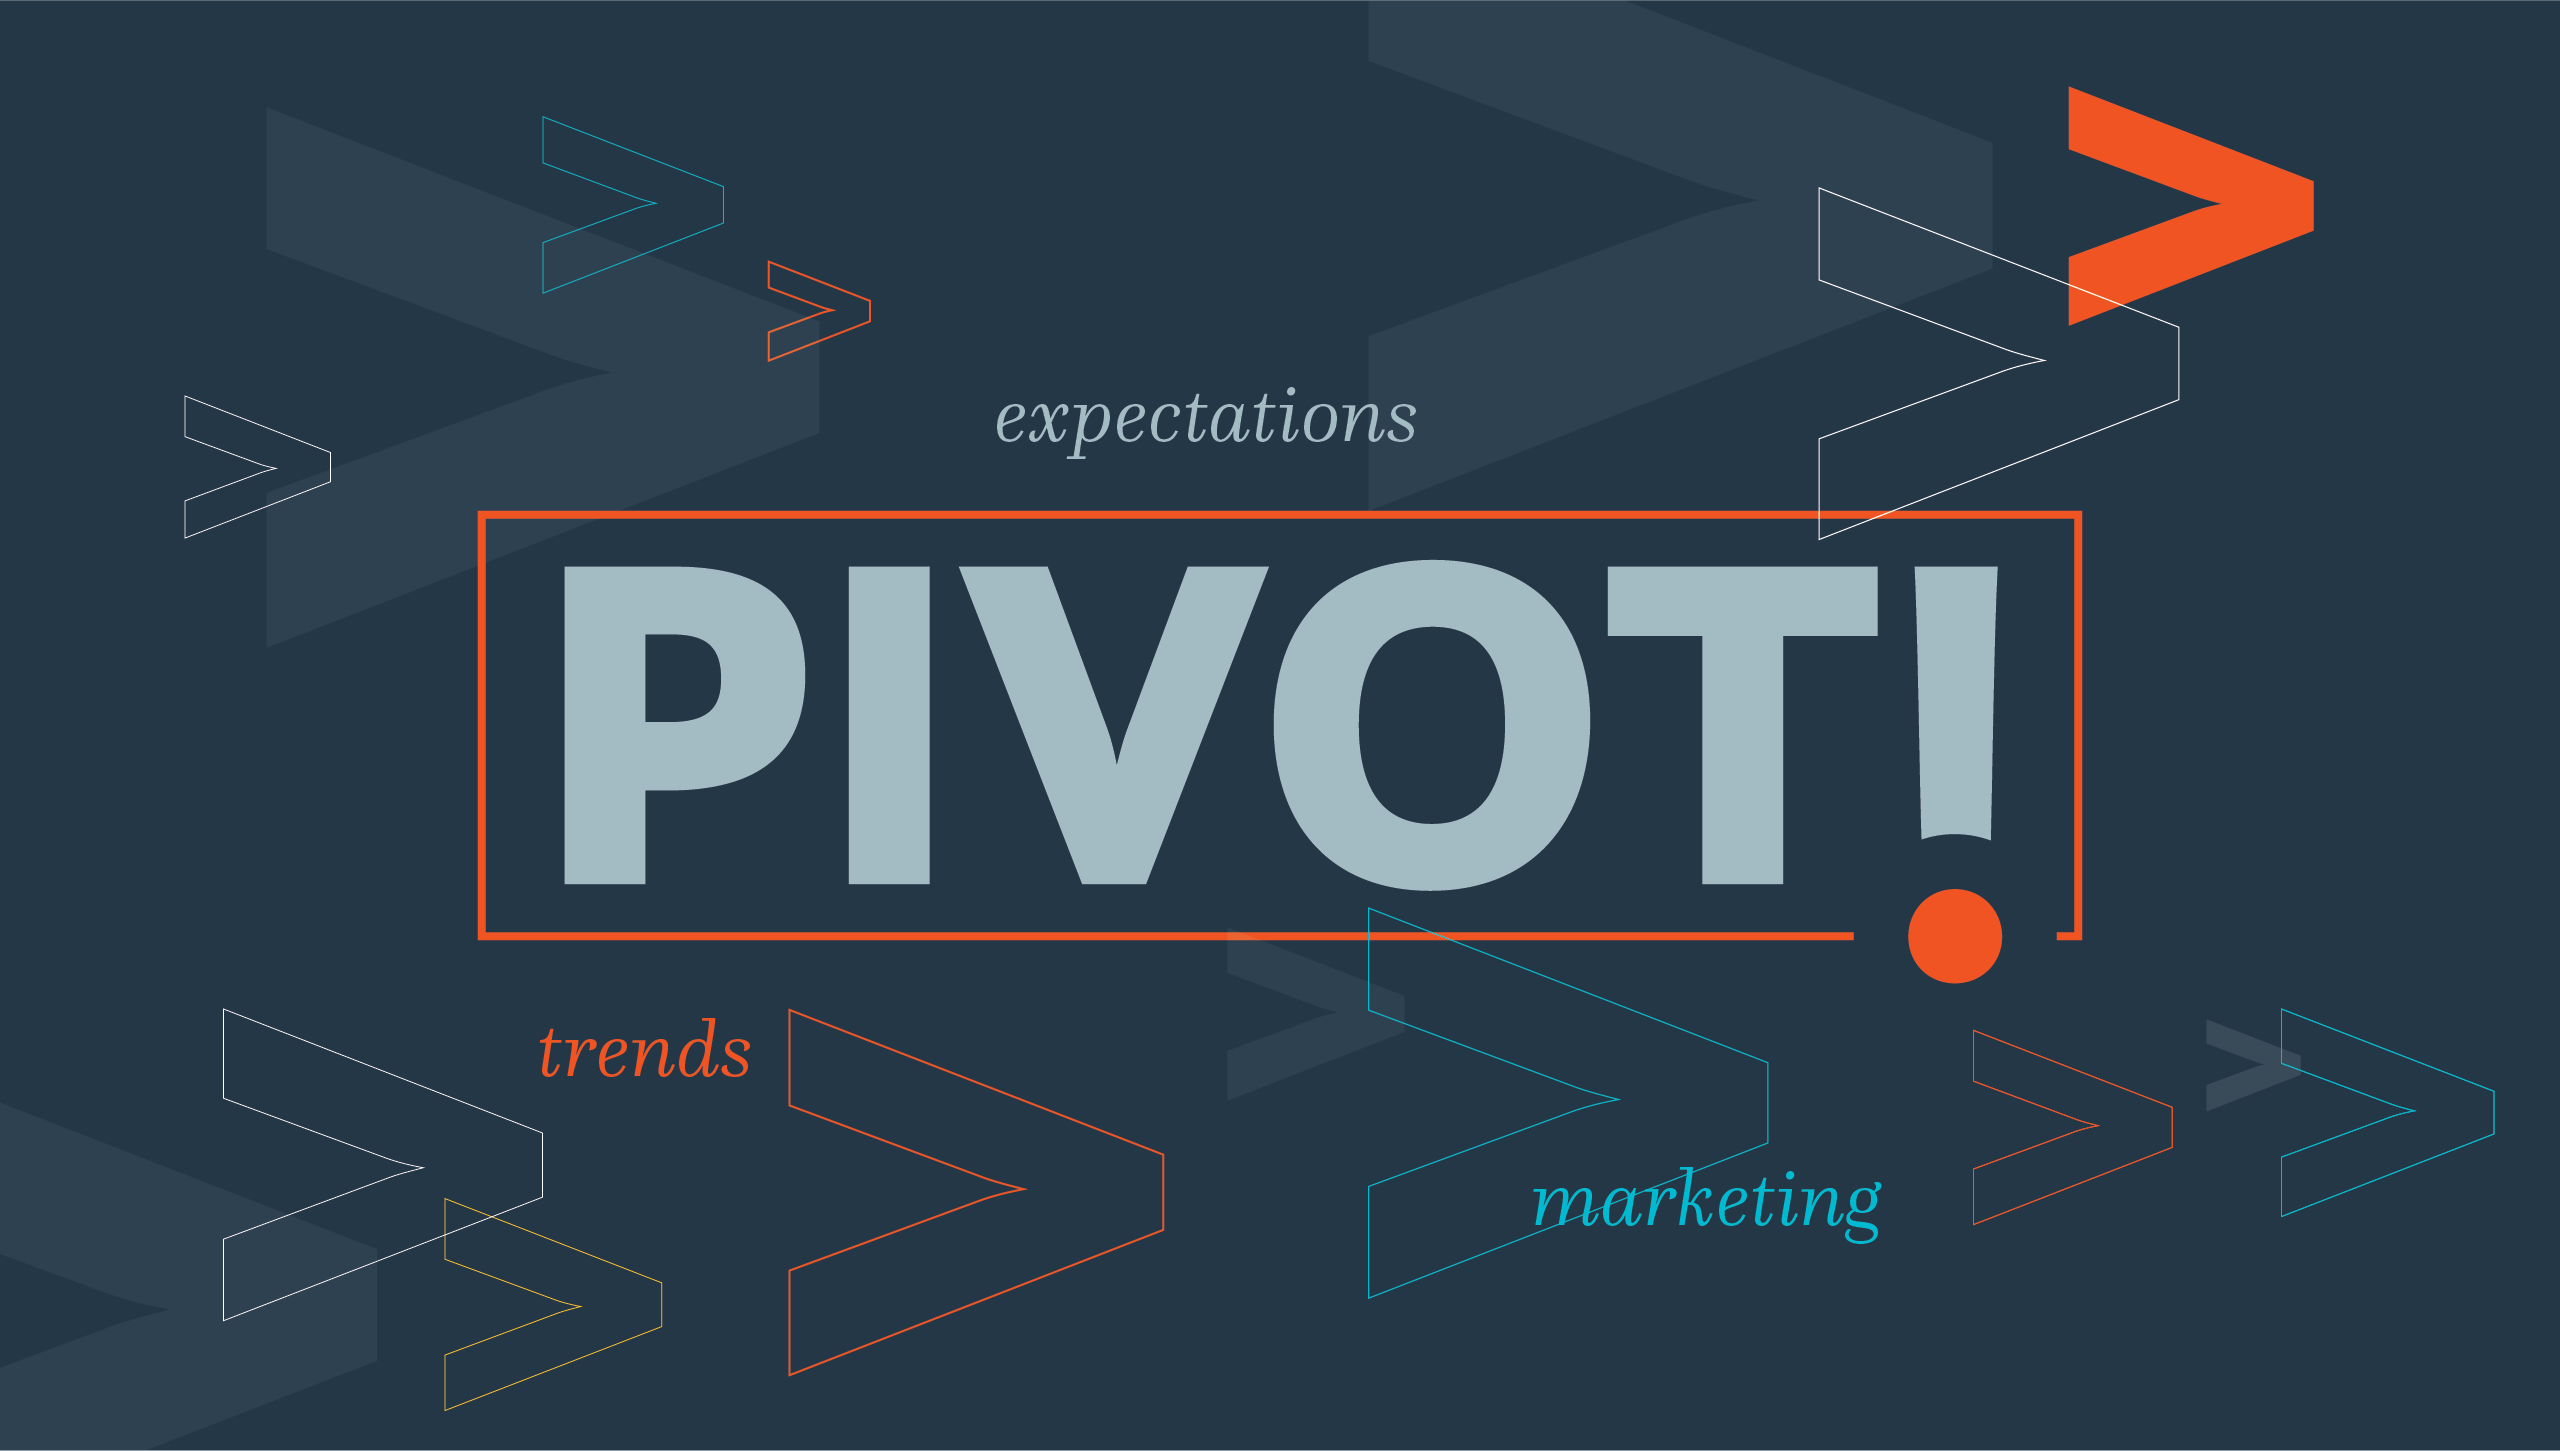 Pivot marketing expectations